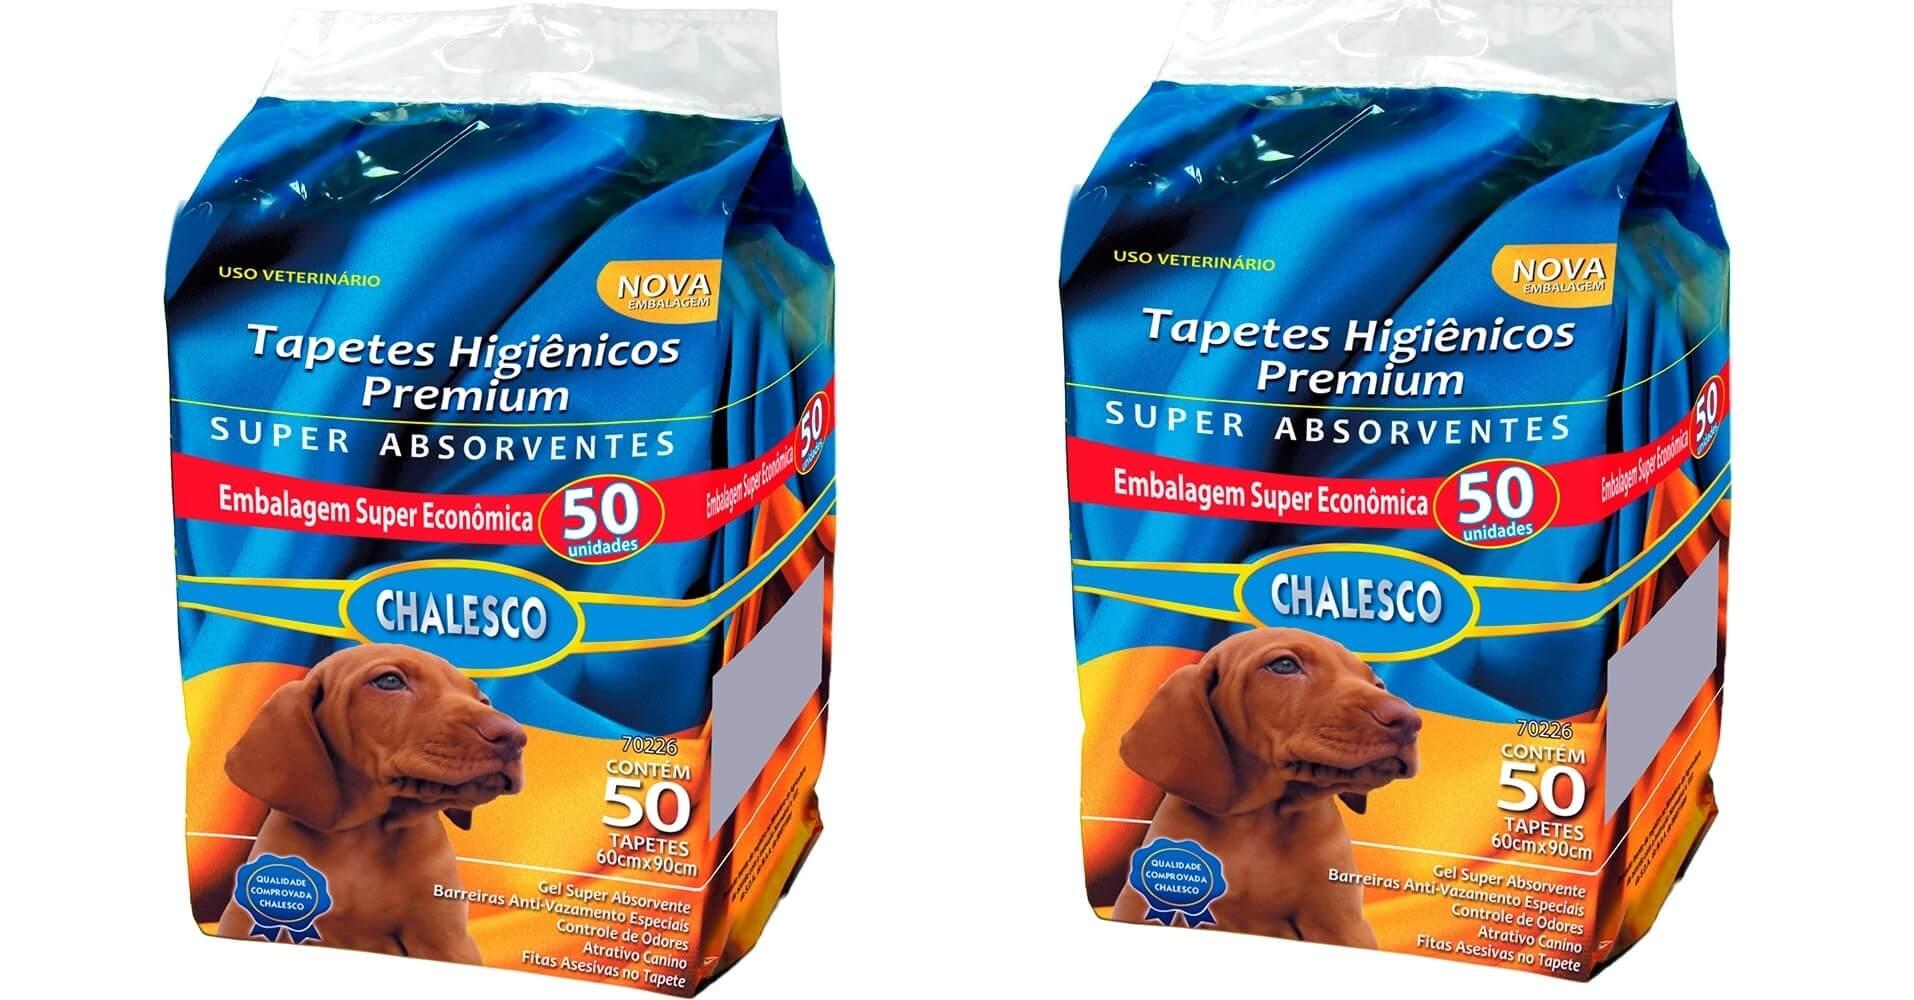 TAPETE HIGIENICO CHALESCO COM 100 UNIDADES